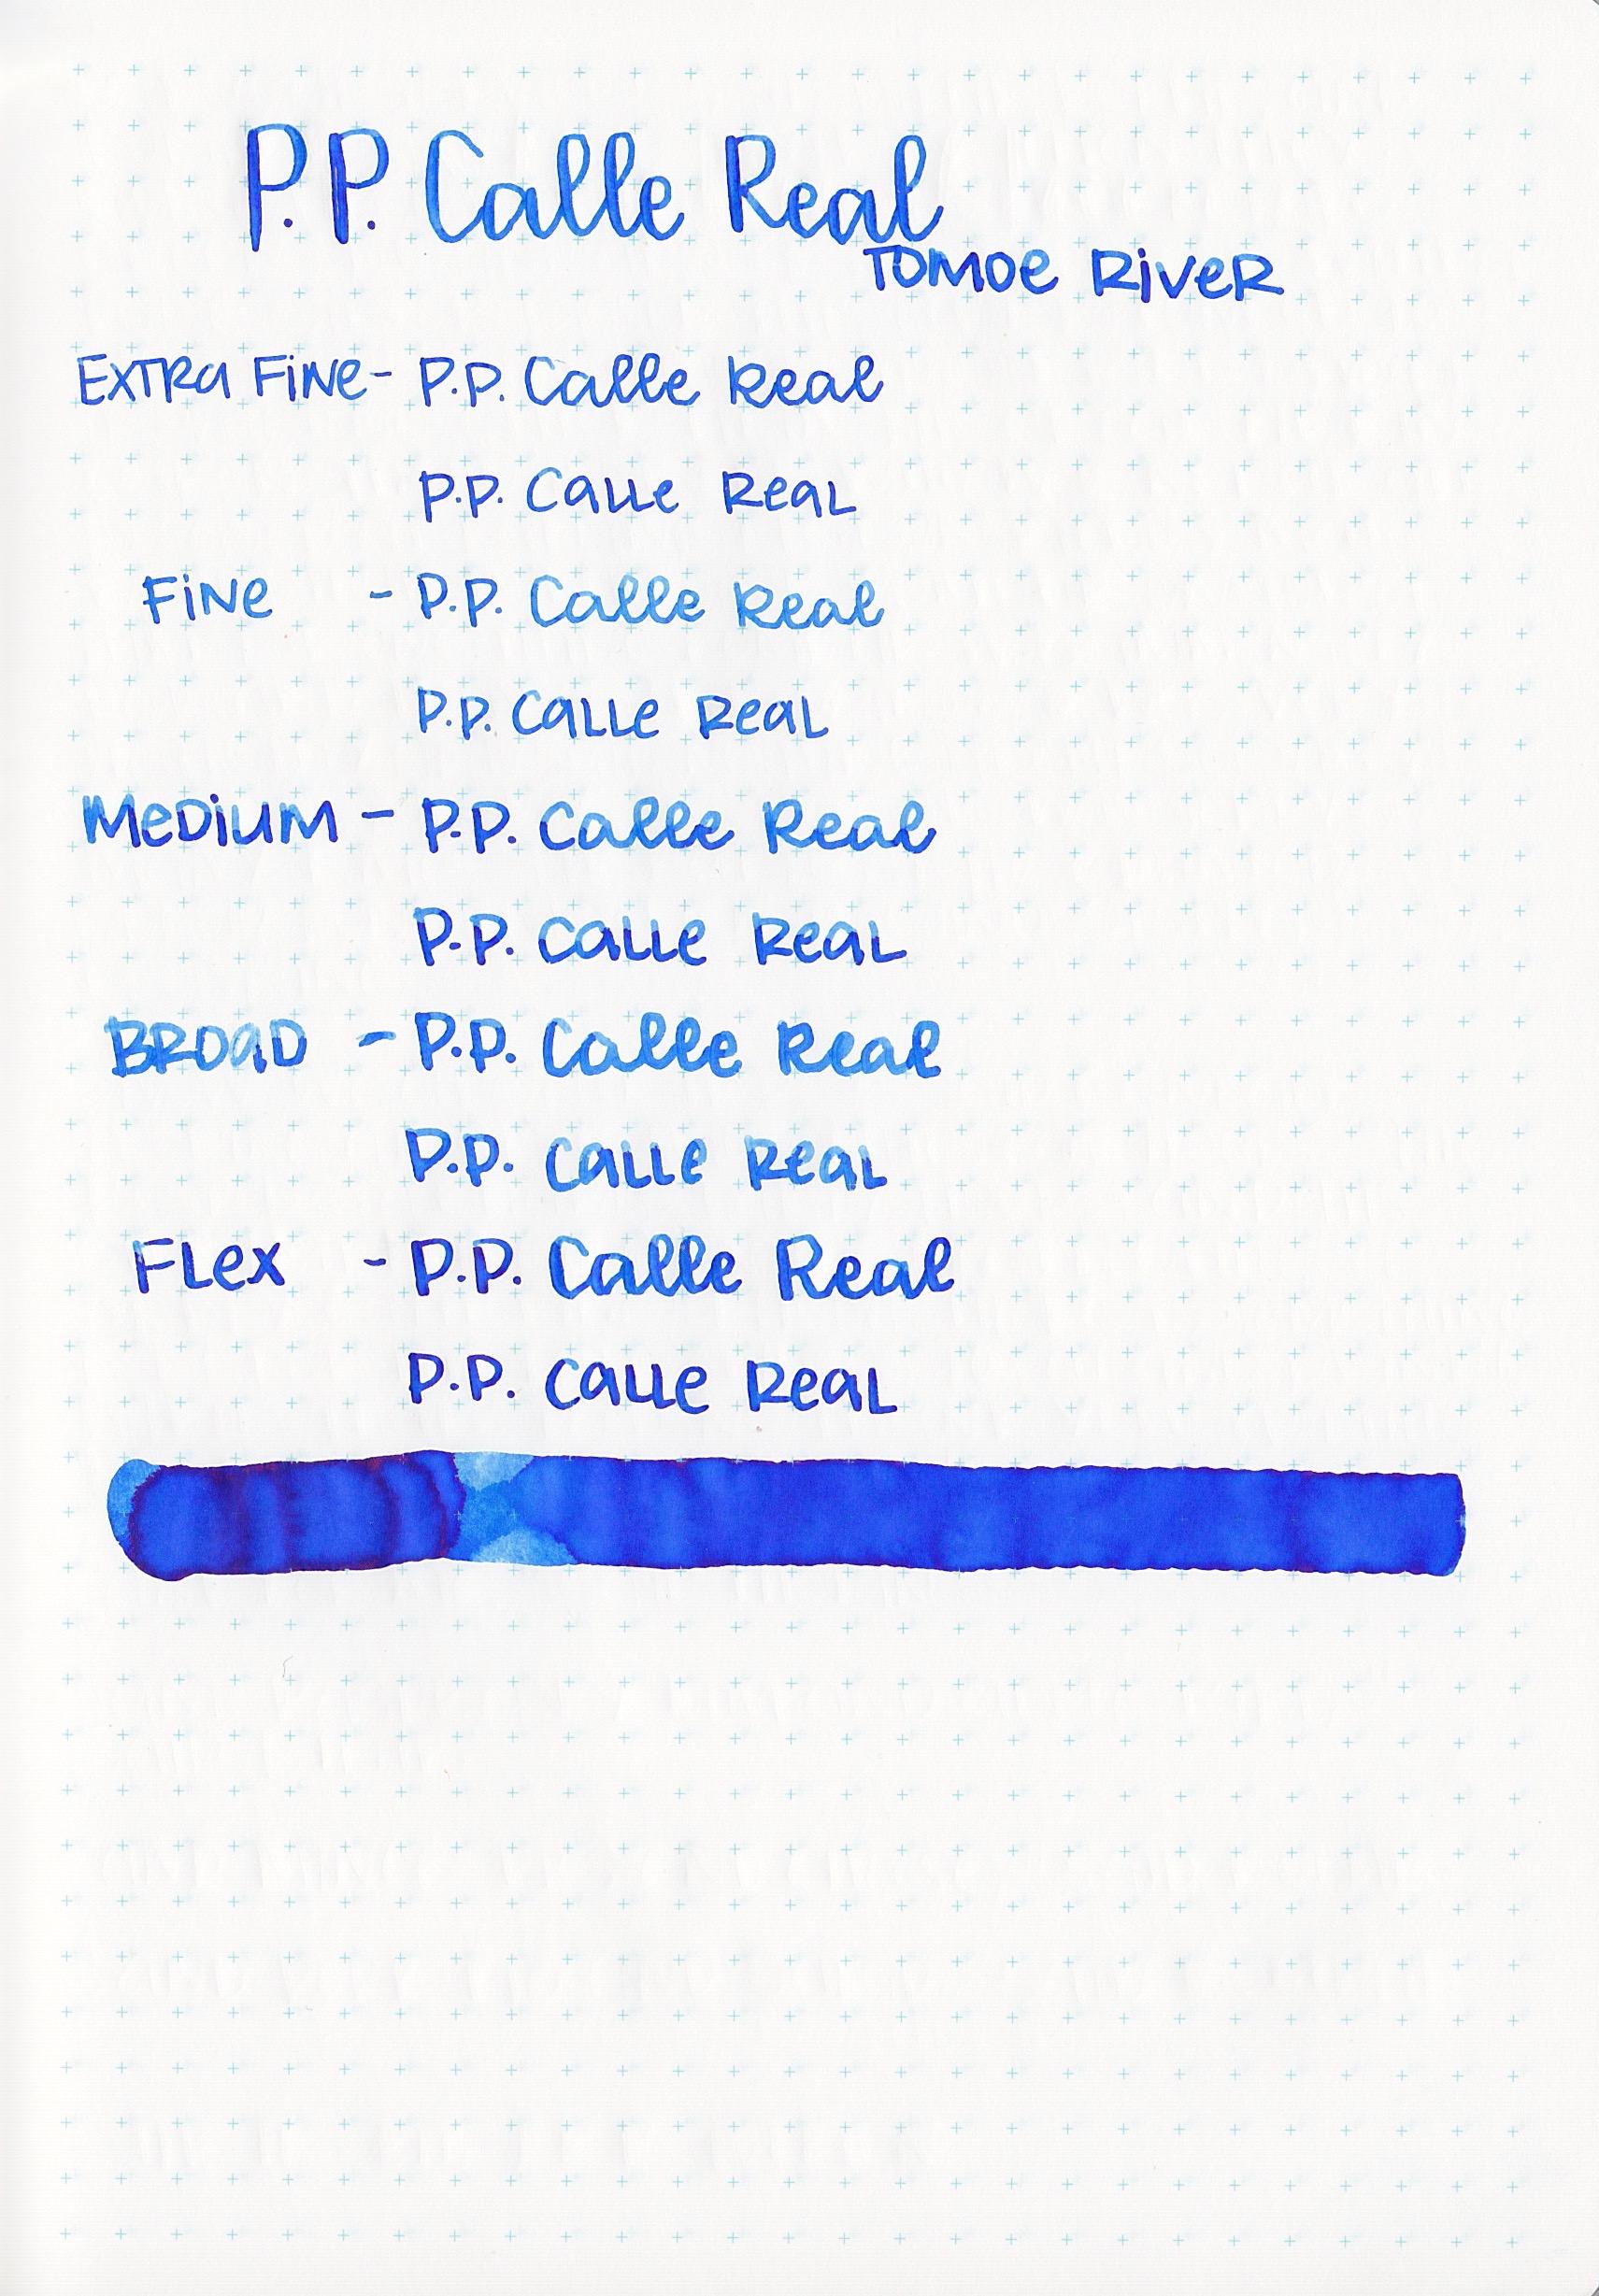 PPCalleReal - 9.jpg